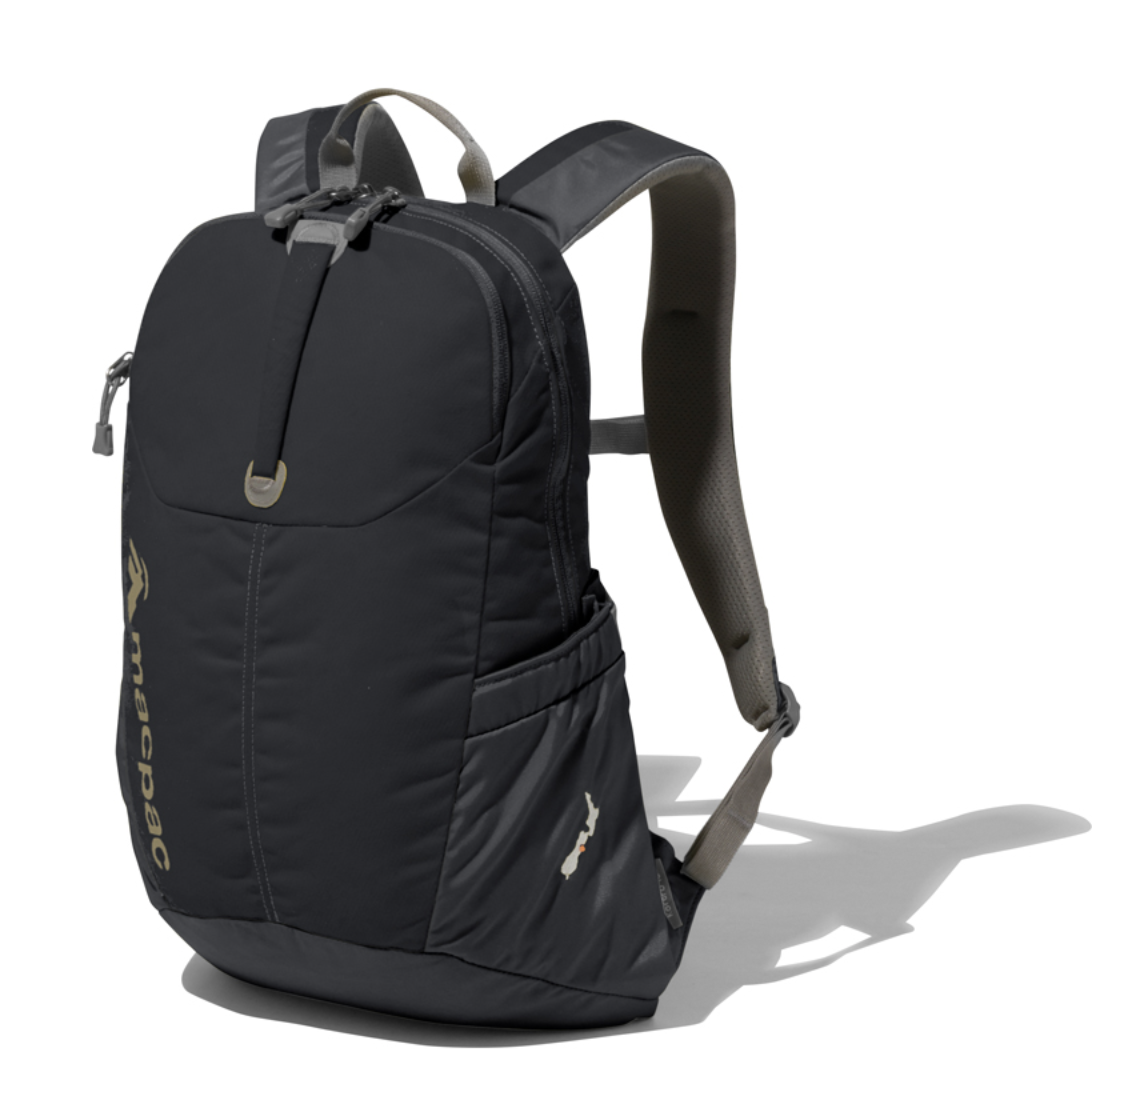 f:id:thebackpack:20191007181202p:plain